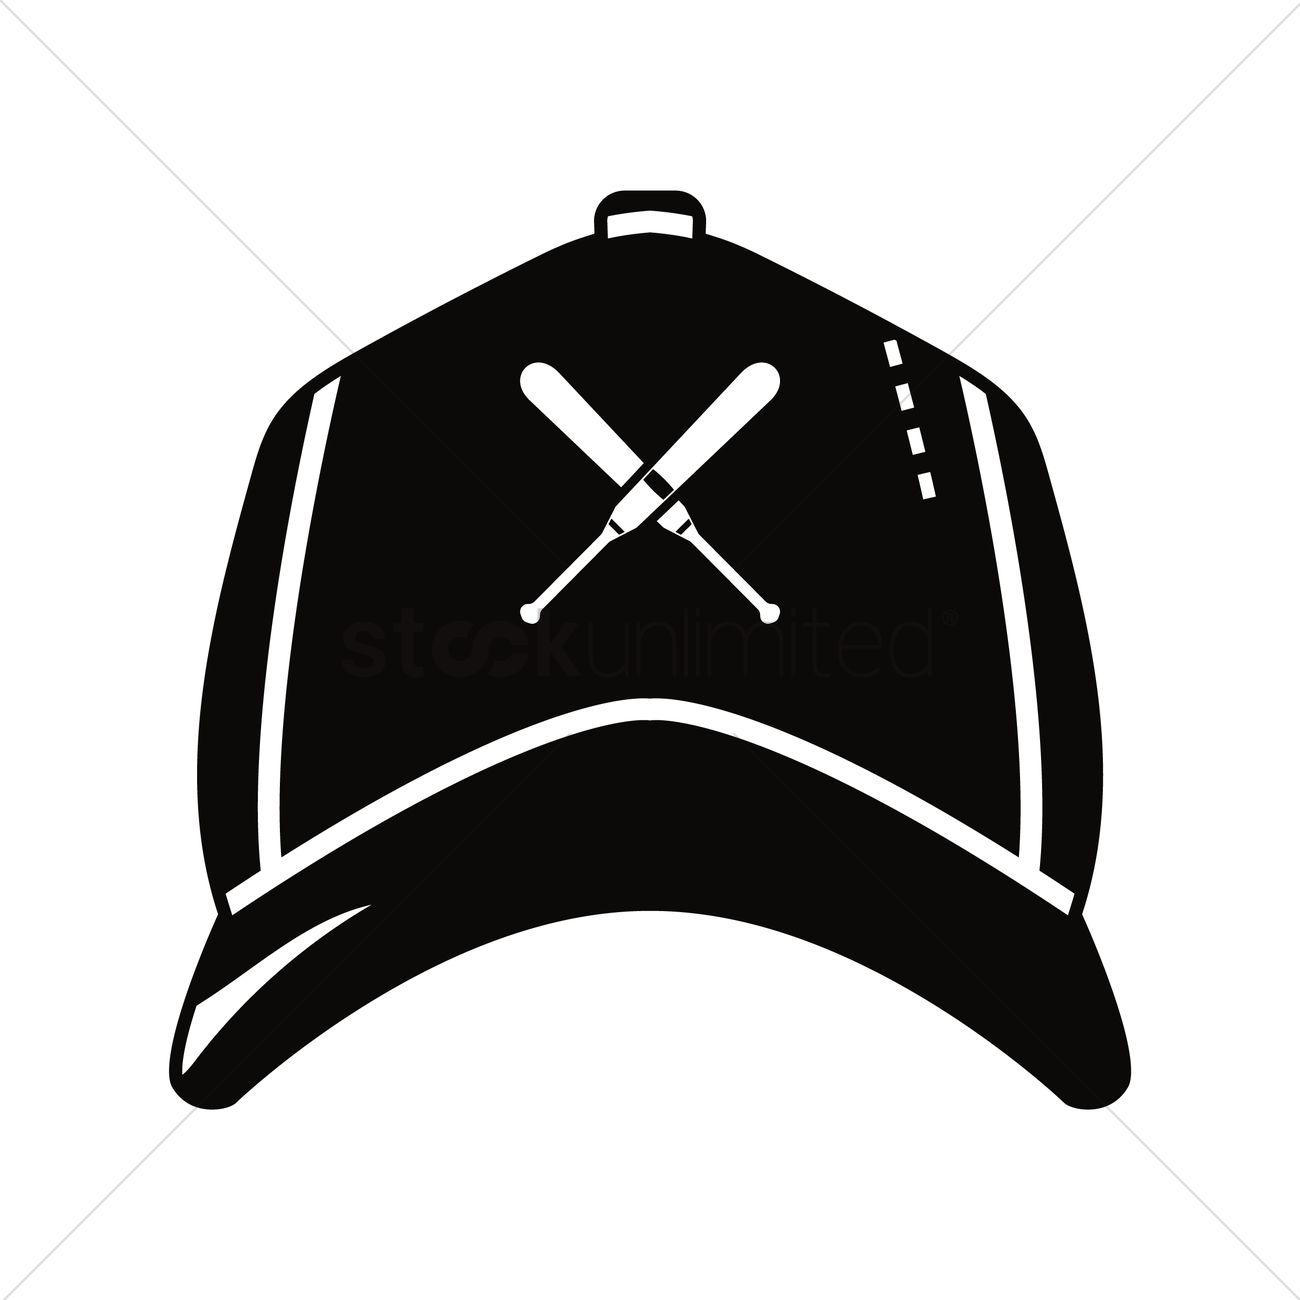 baseball cap vector image 1987870 stockunlimited rh stockunlimited com baseball cap vector art baseball cap vector template free